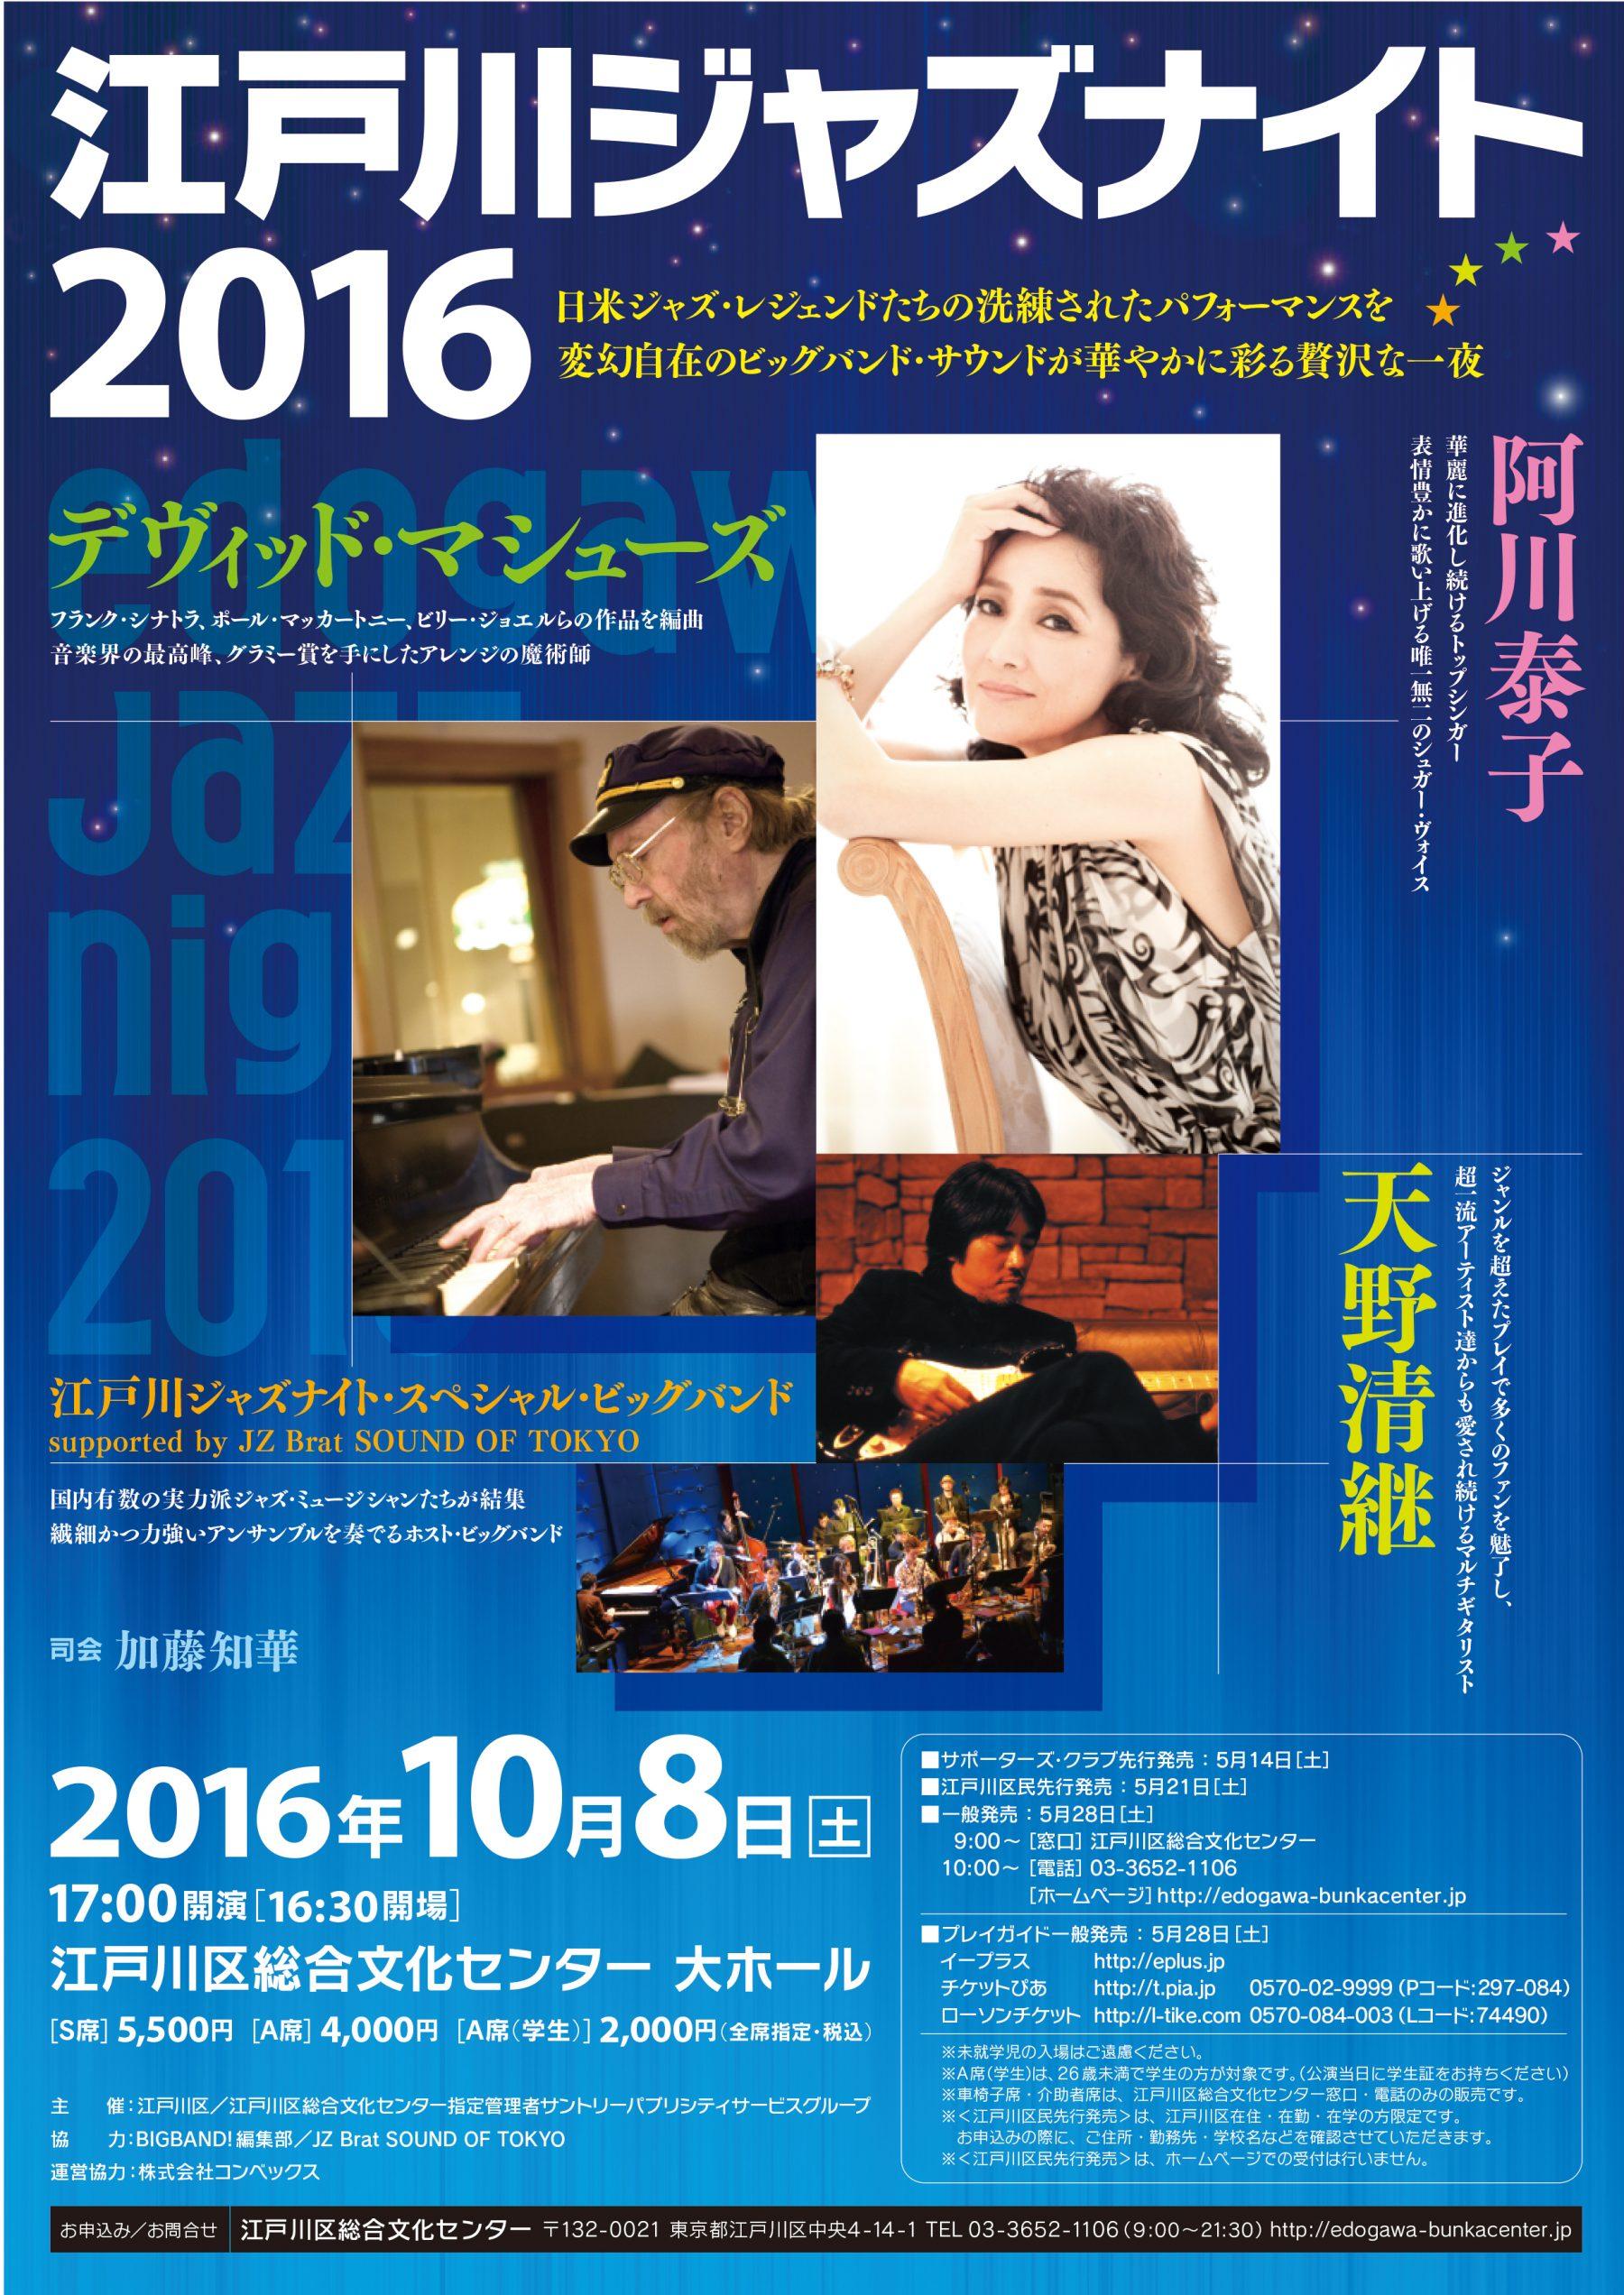 jazznight2016_flyer-1